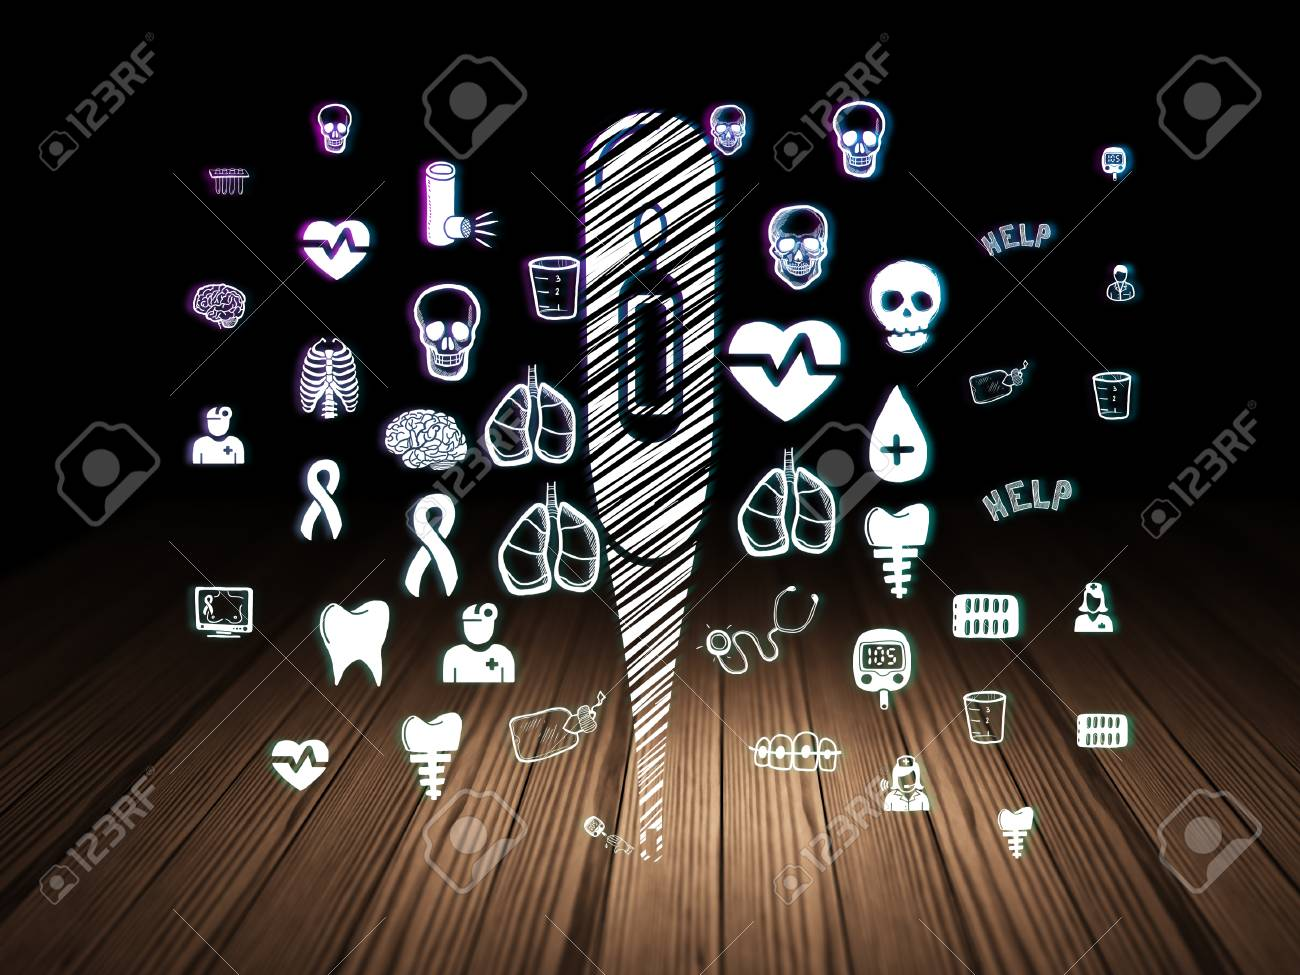 Gezondheidszorgconcept: gloeiend thermometelpictogram in grunge